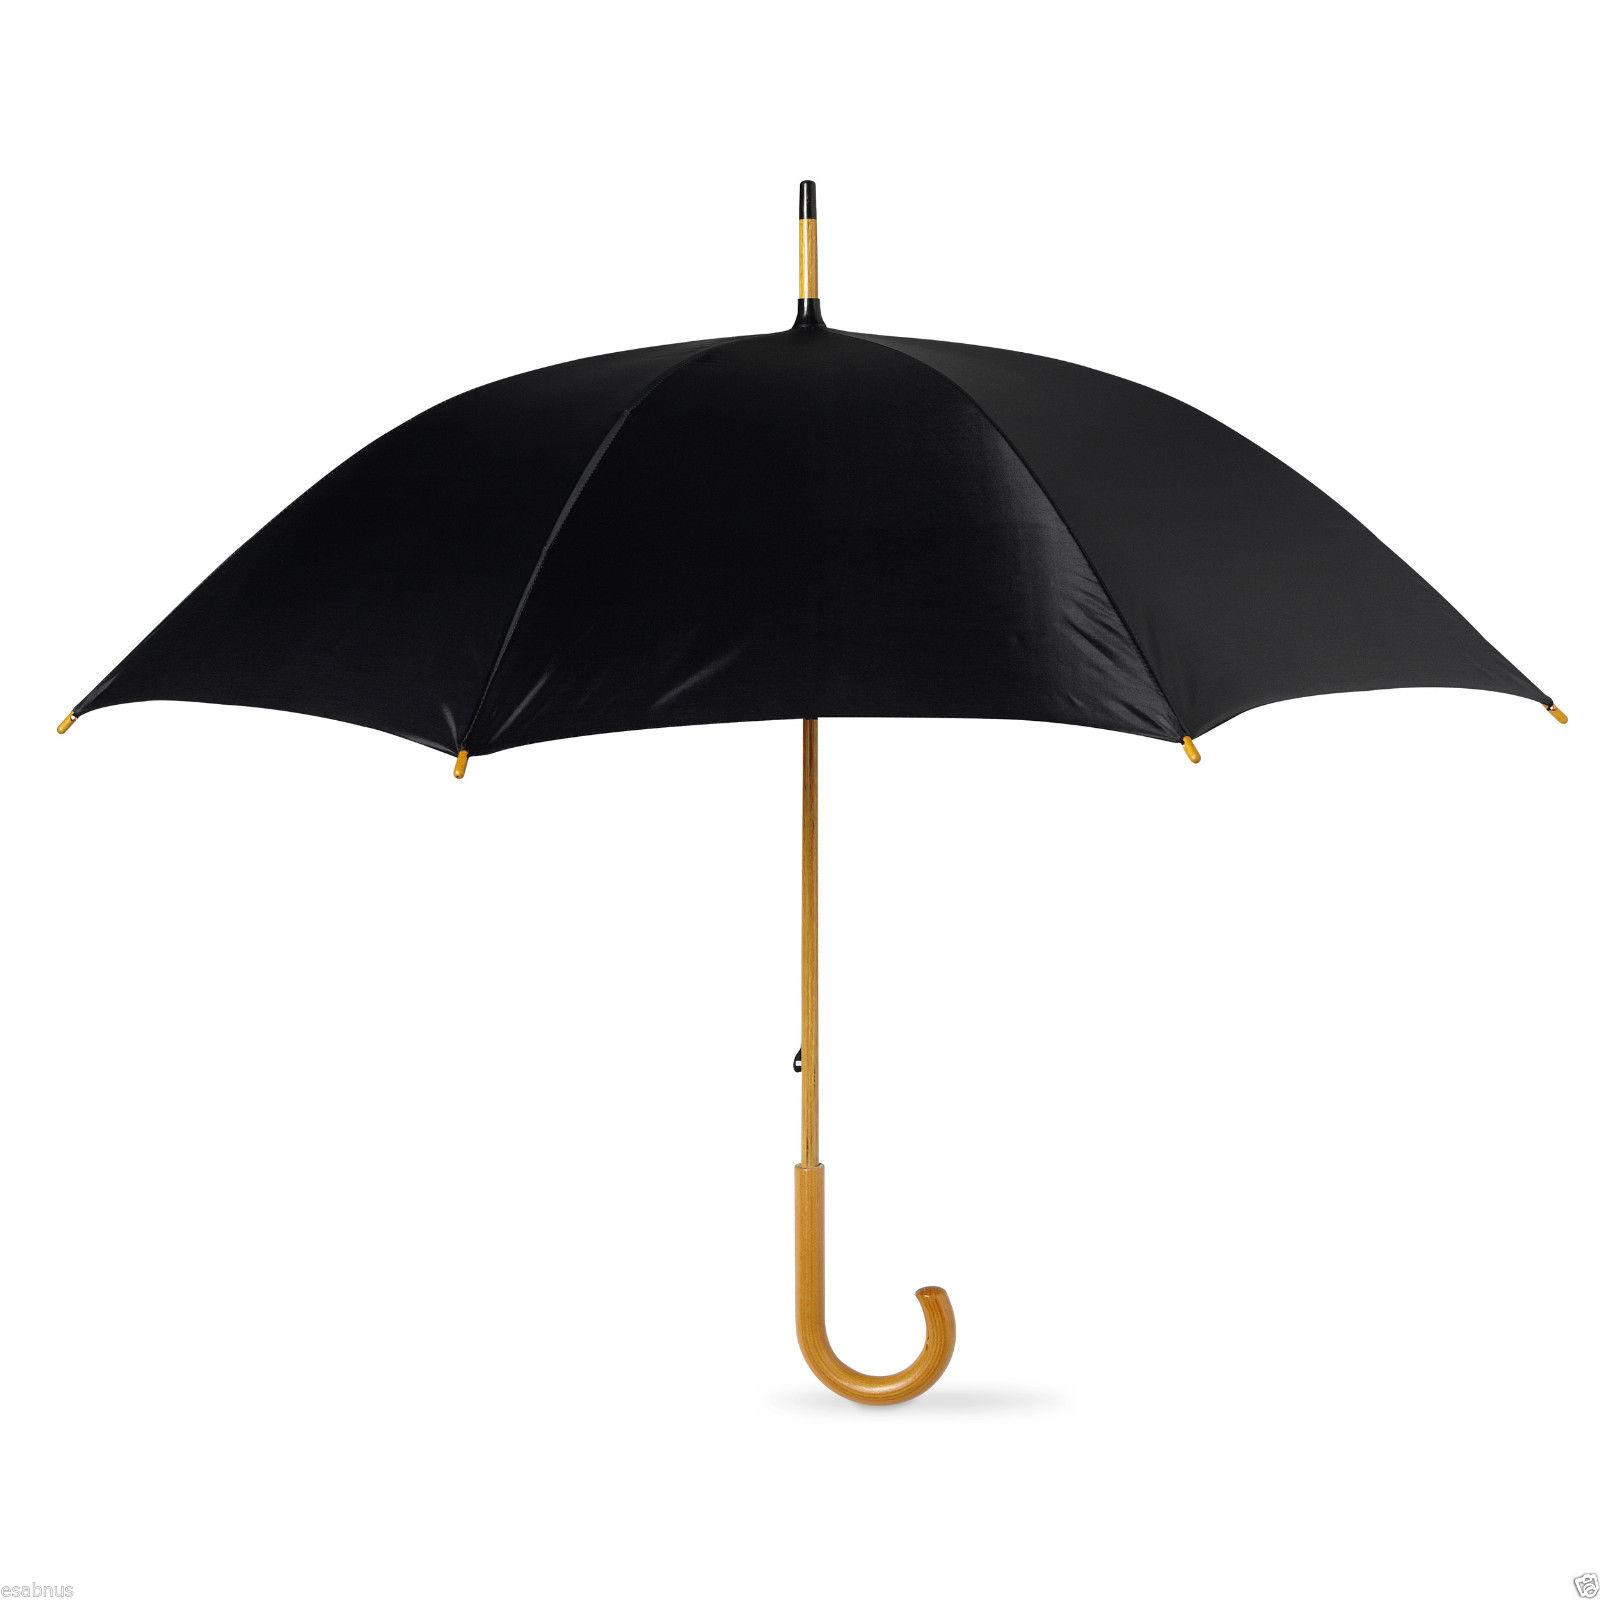 5-Wedding-Style-Umbrellas-crooked-wooden-handle-Size-90cm-long-x-106cm-Manual